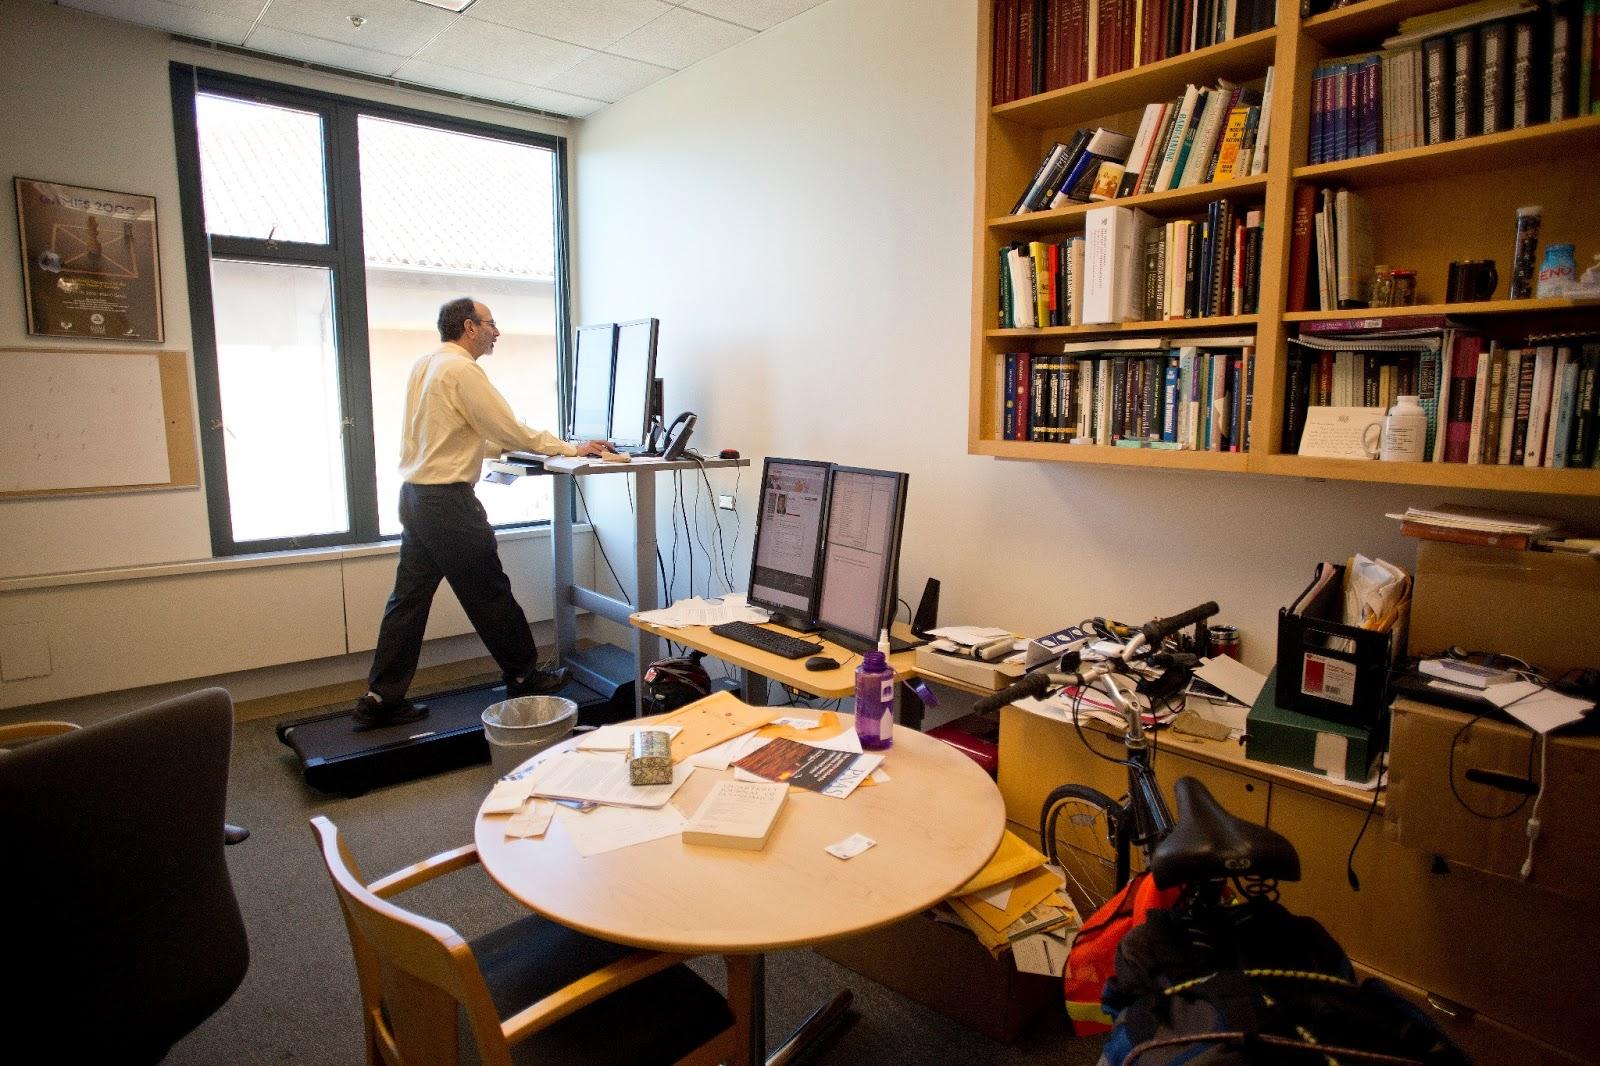 Executive Treadmill Desk Treadmill desk